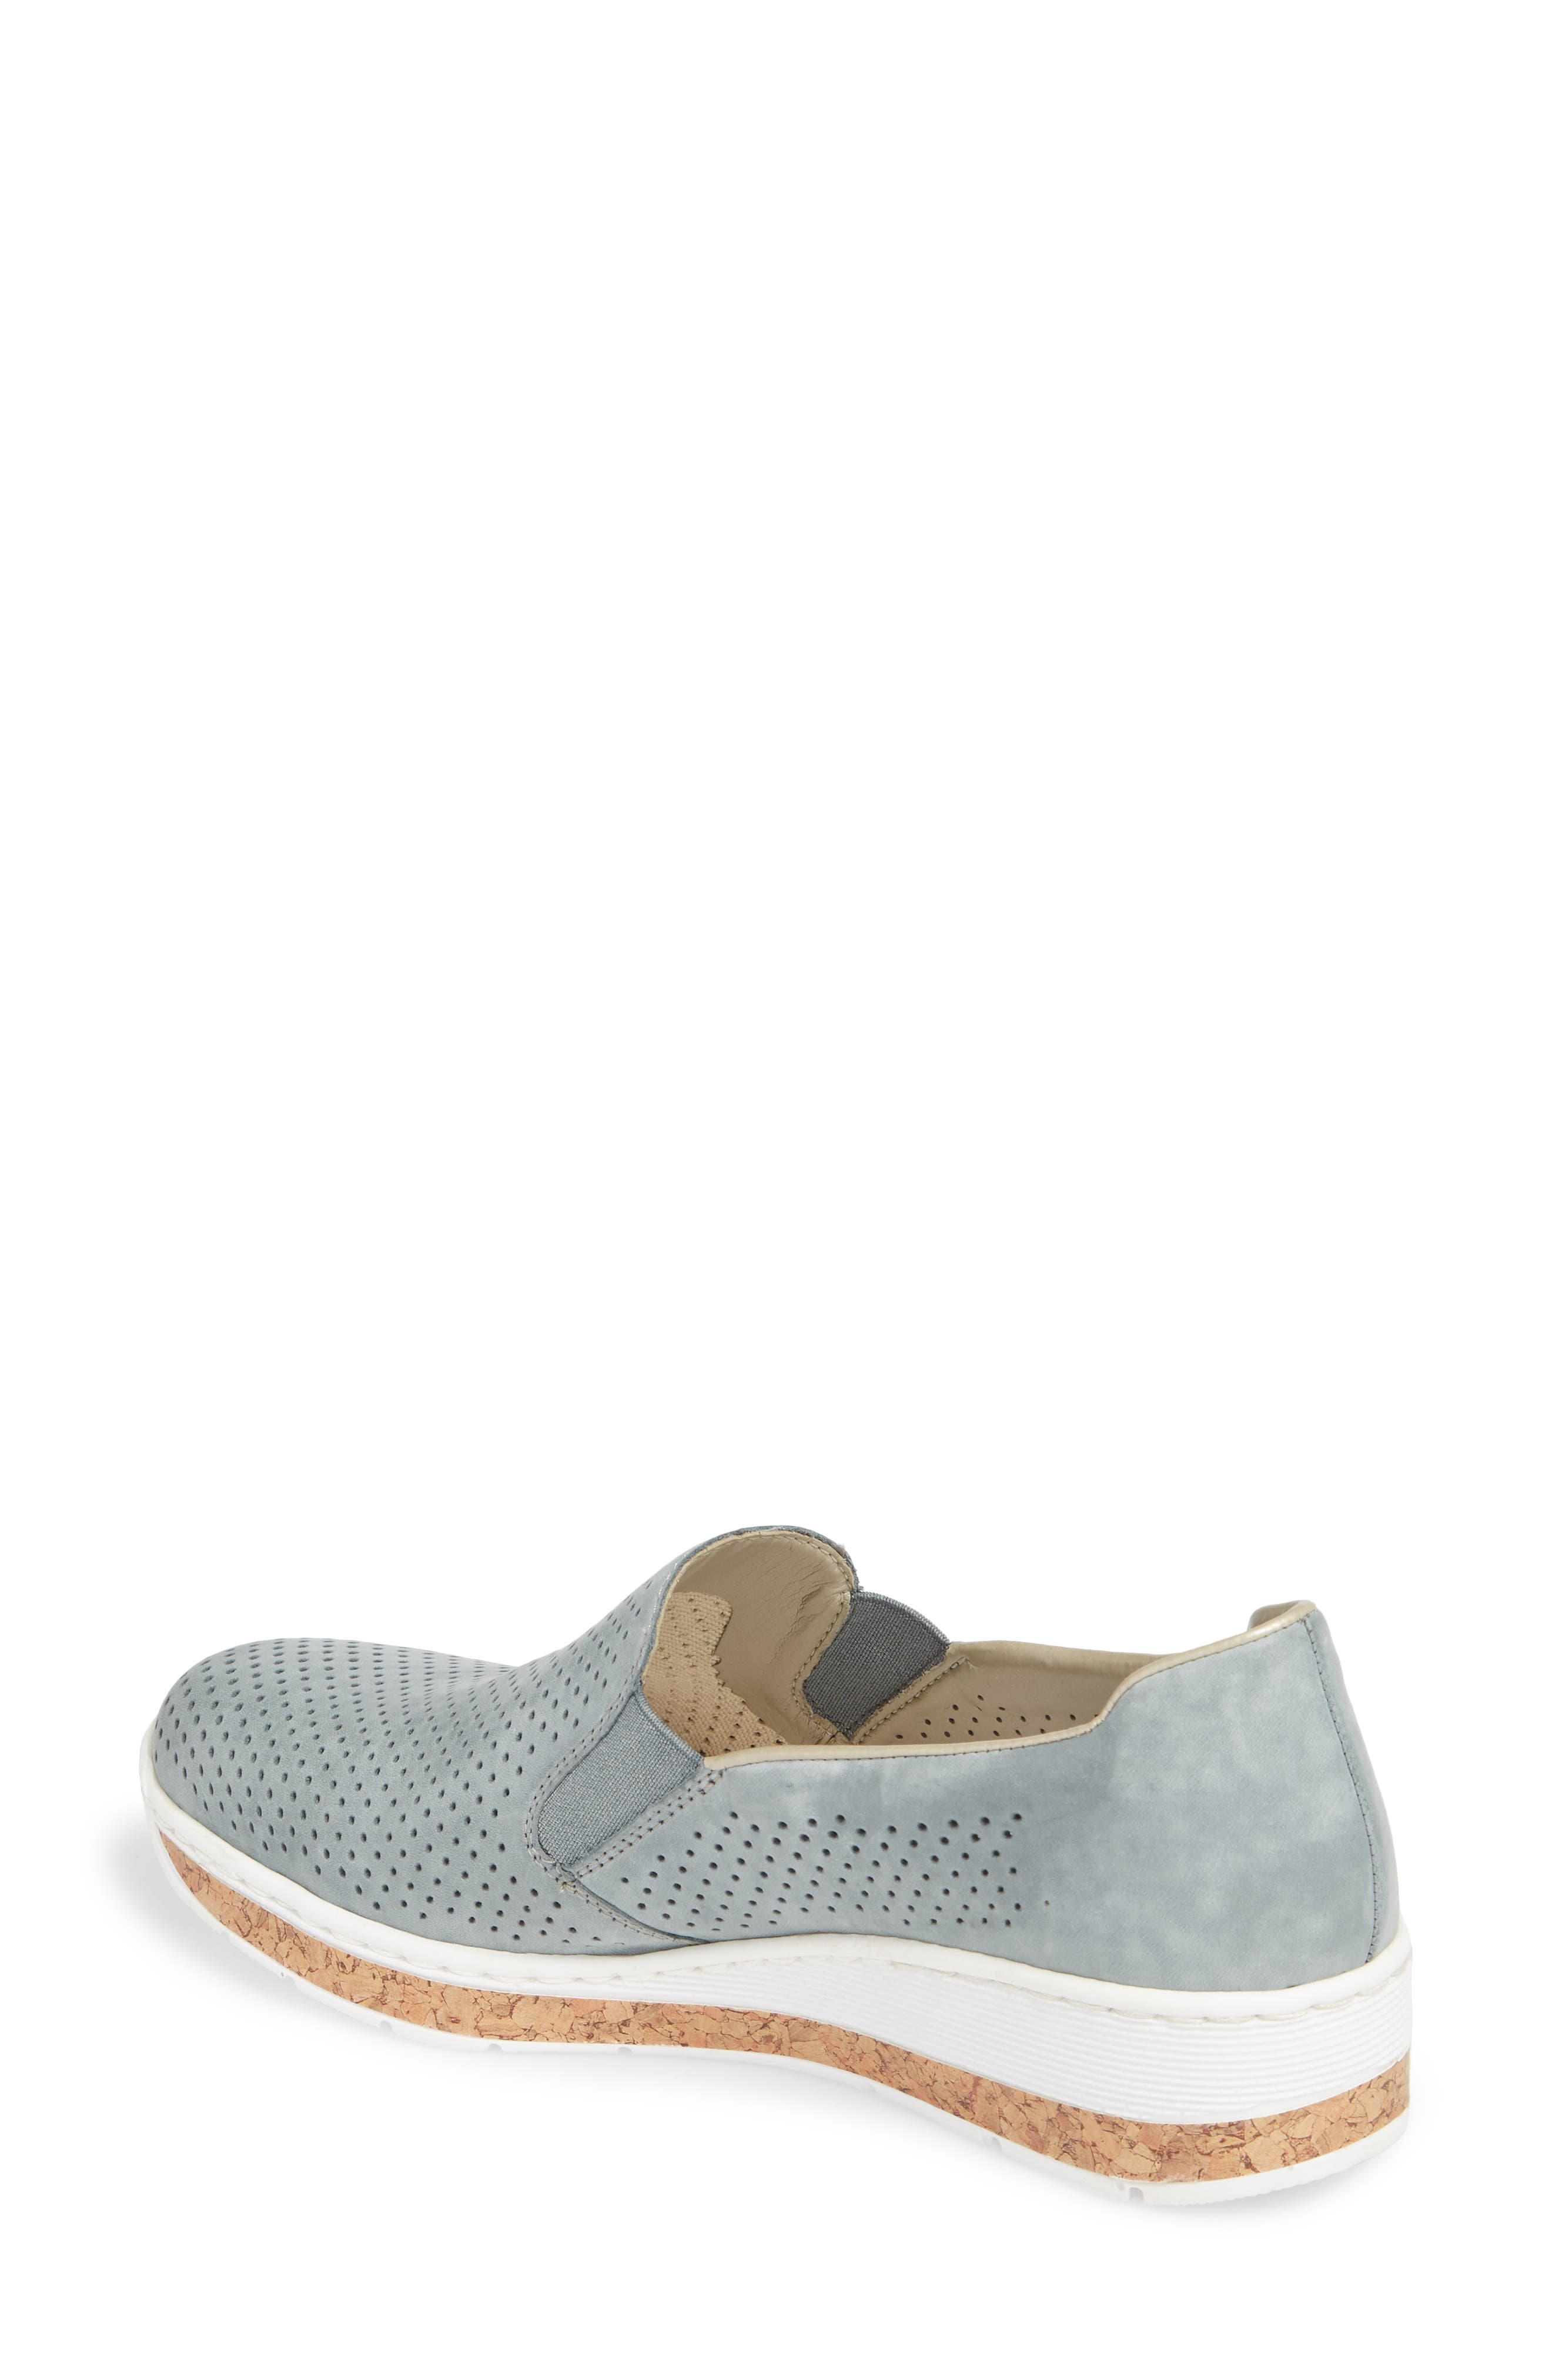 Doris 75 Wedge Sneaker,                             Alternate thumbnail 2, color,                             Royal Faux Leather